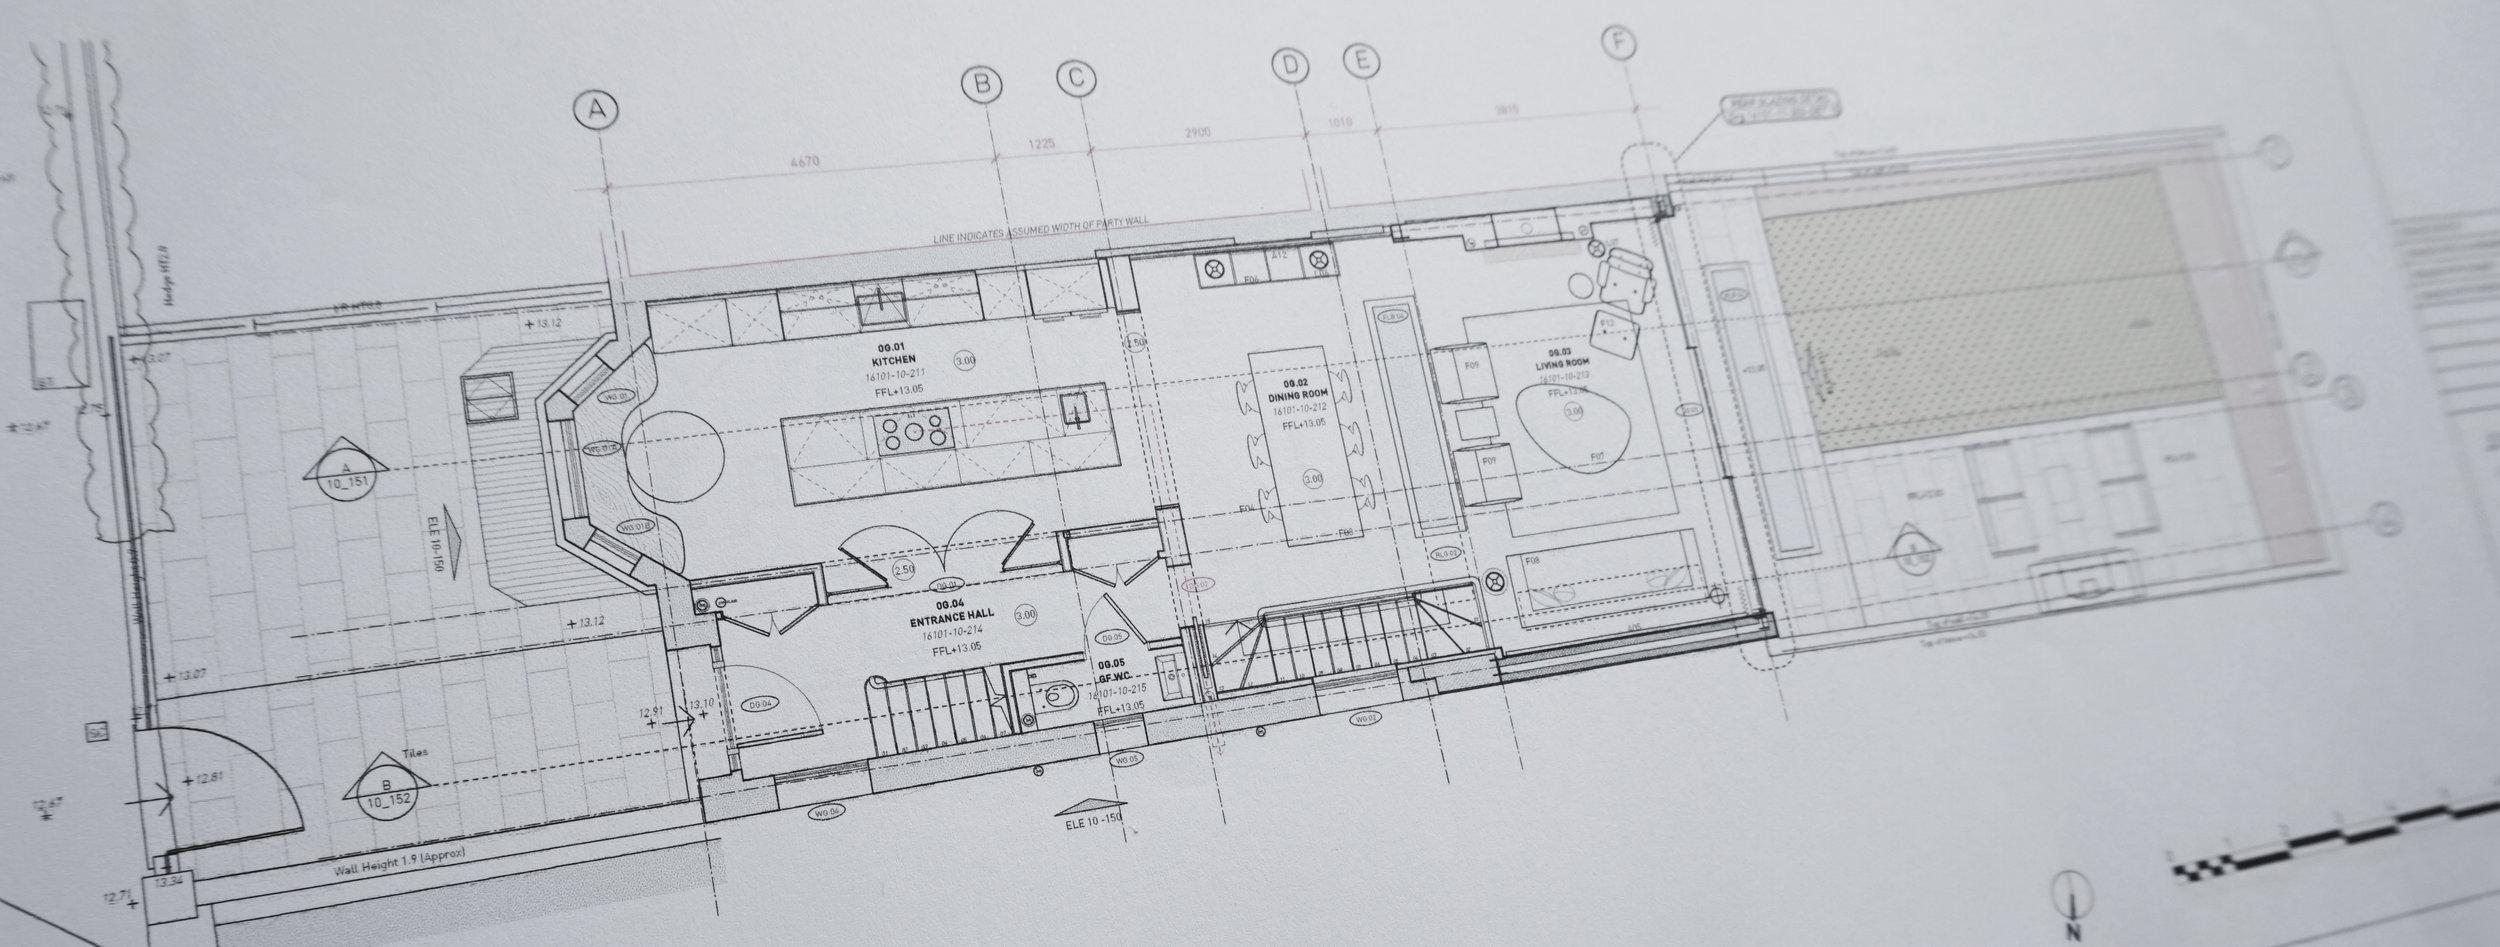 John Foat Architects Plan